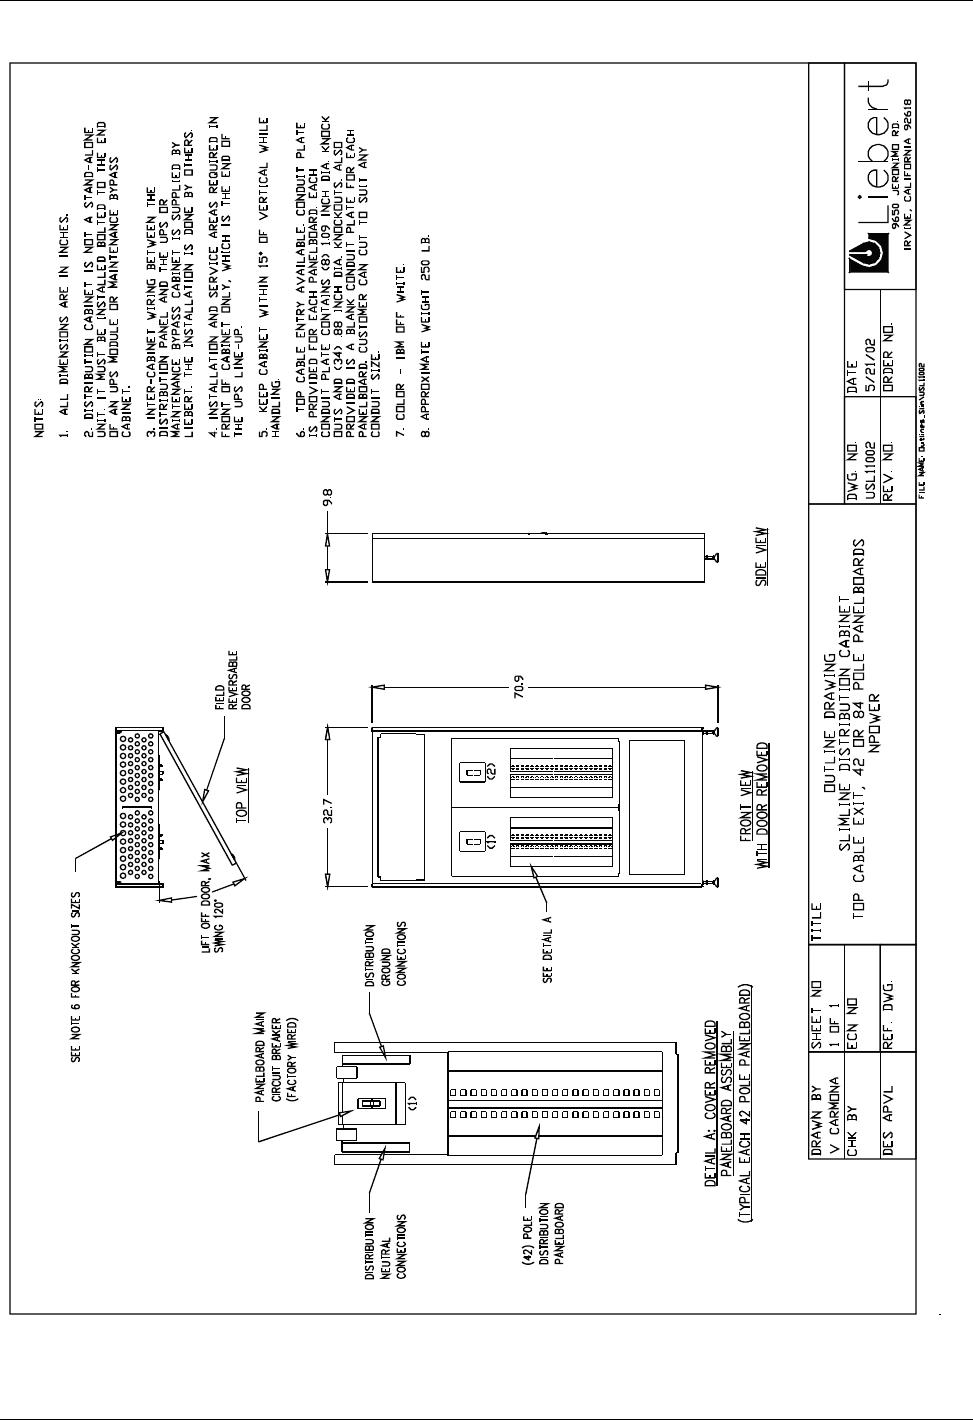 Liebert Npower Ups Wiring Diagram Electrical Diagrams In Line Manual De Instalacion Goodman Vent Motor